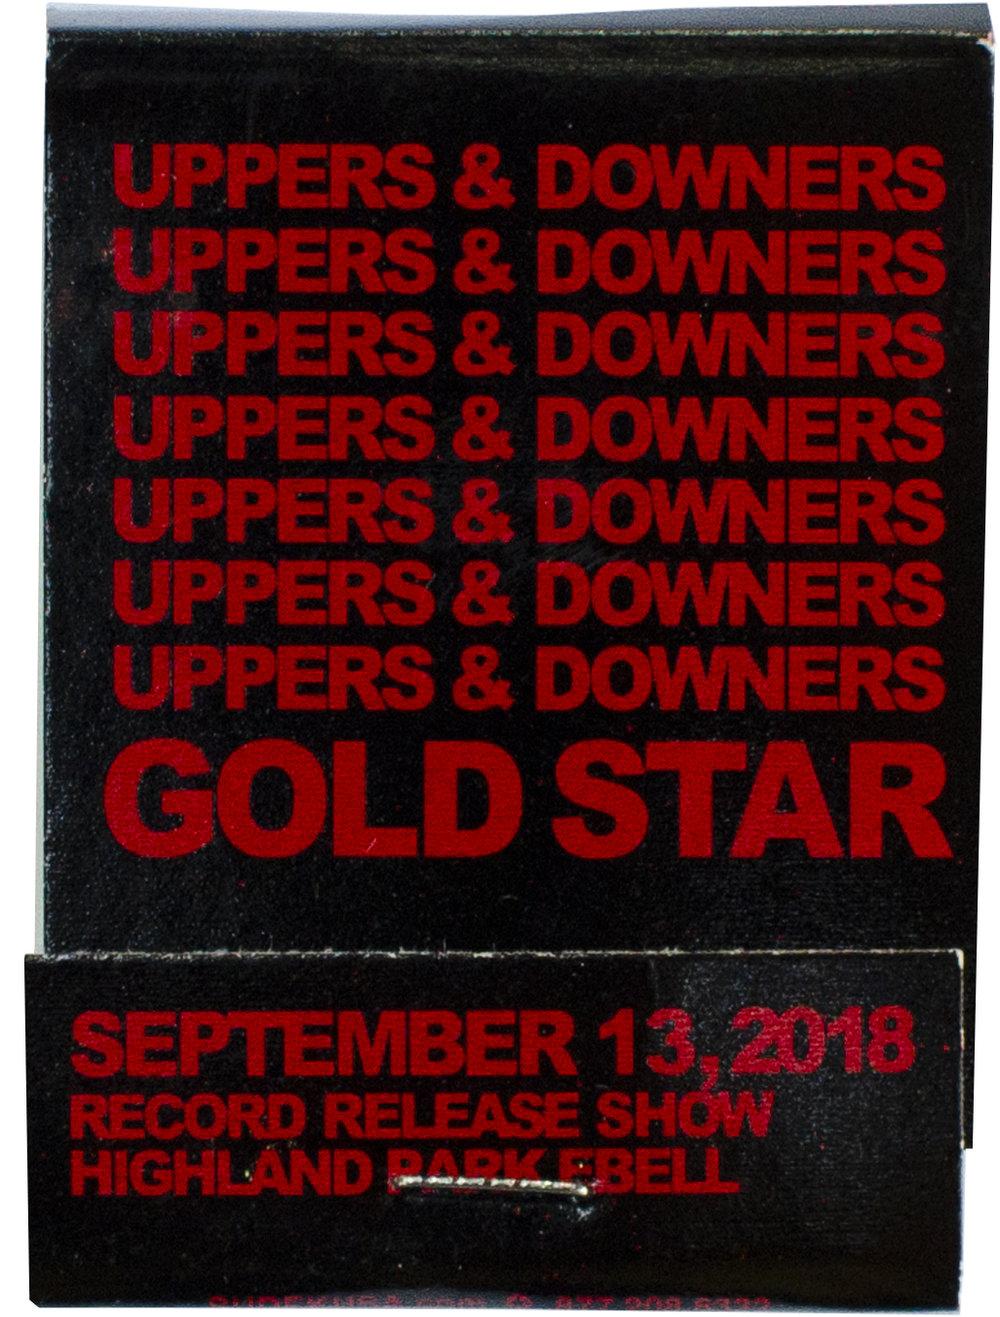 2018-9-13 Gold Star.jpg